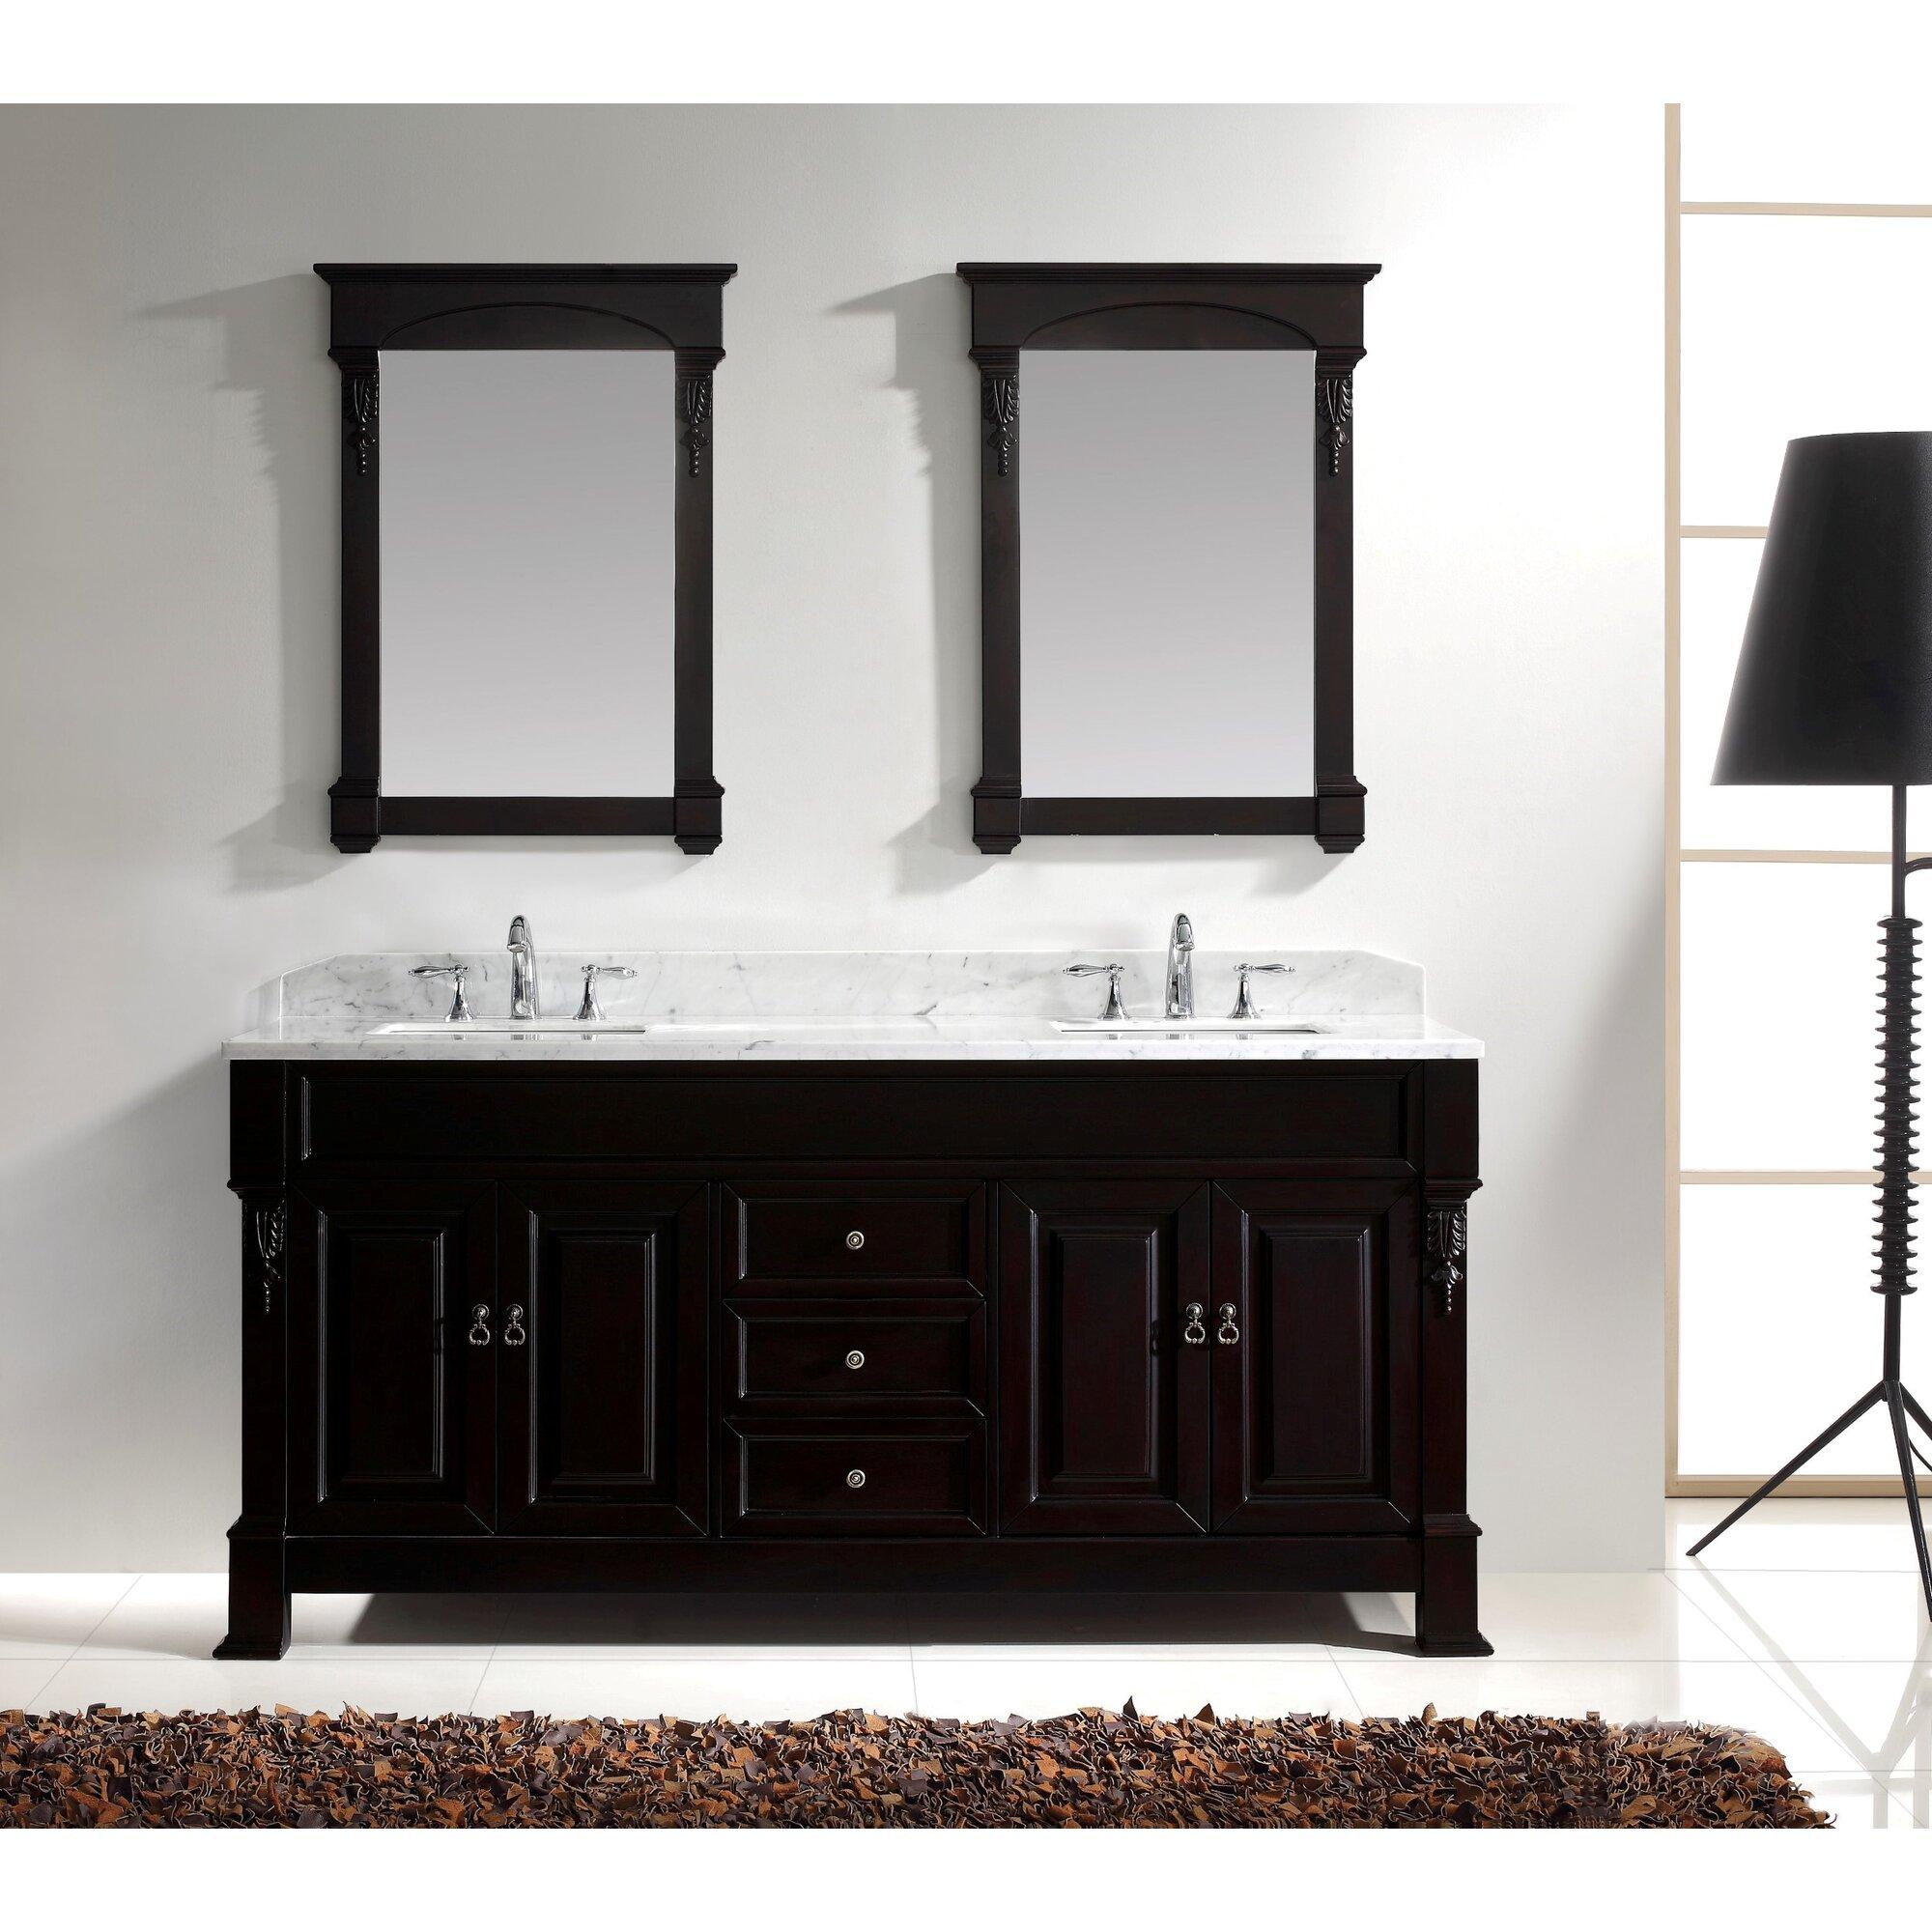 Virtu bathroom accessories - Huntshire 71 25 Double Bathroom Vanity Set With White Marble Top And Mirror